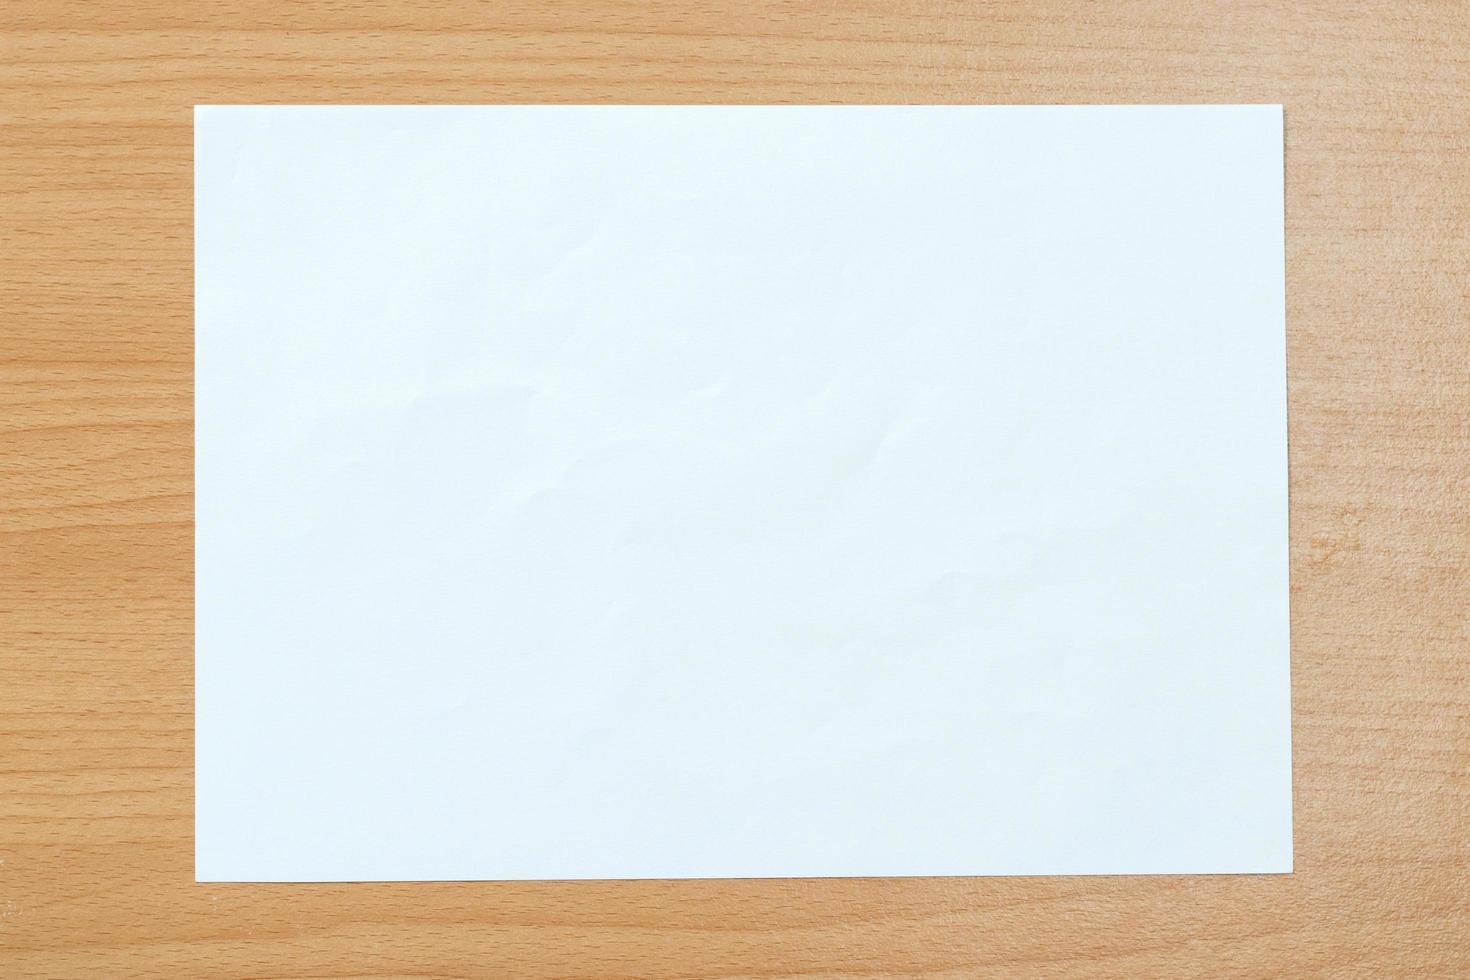 papier blanc vierge isolé photo